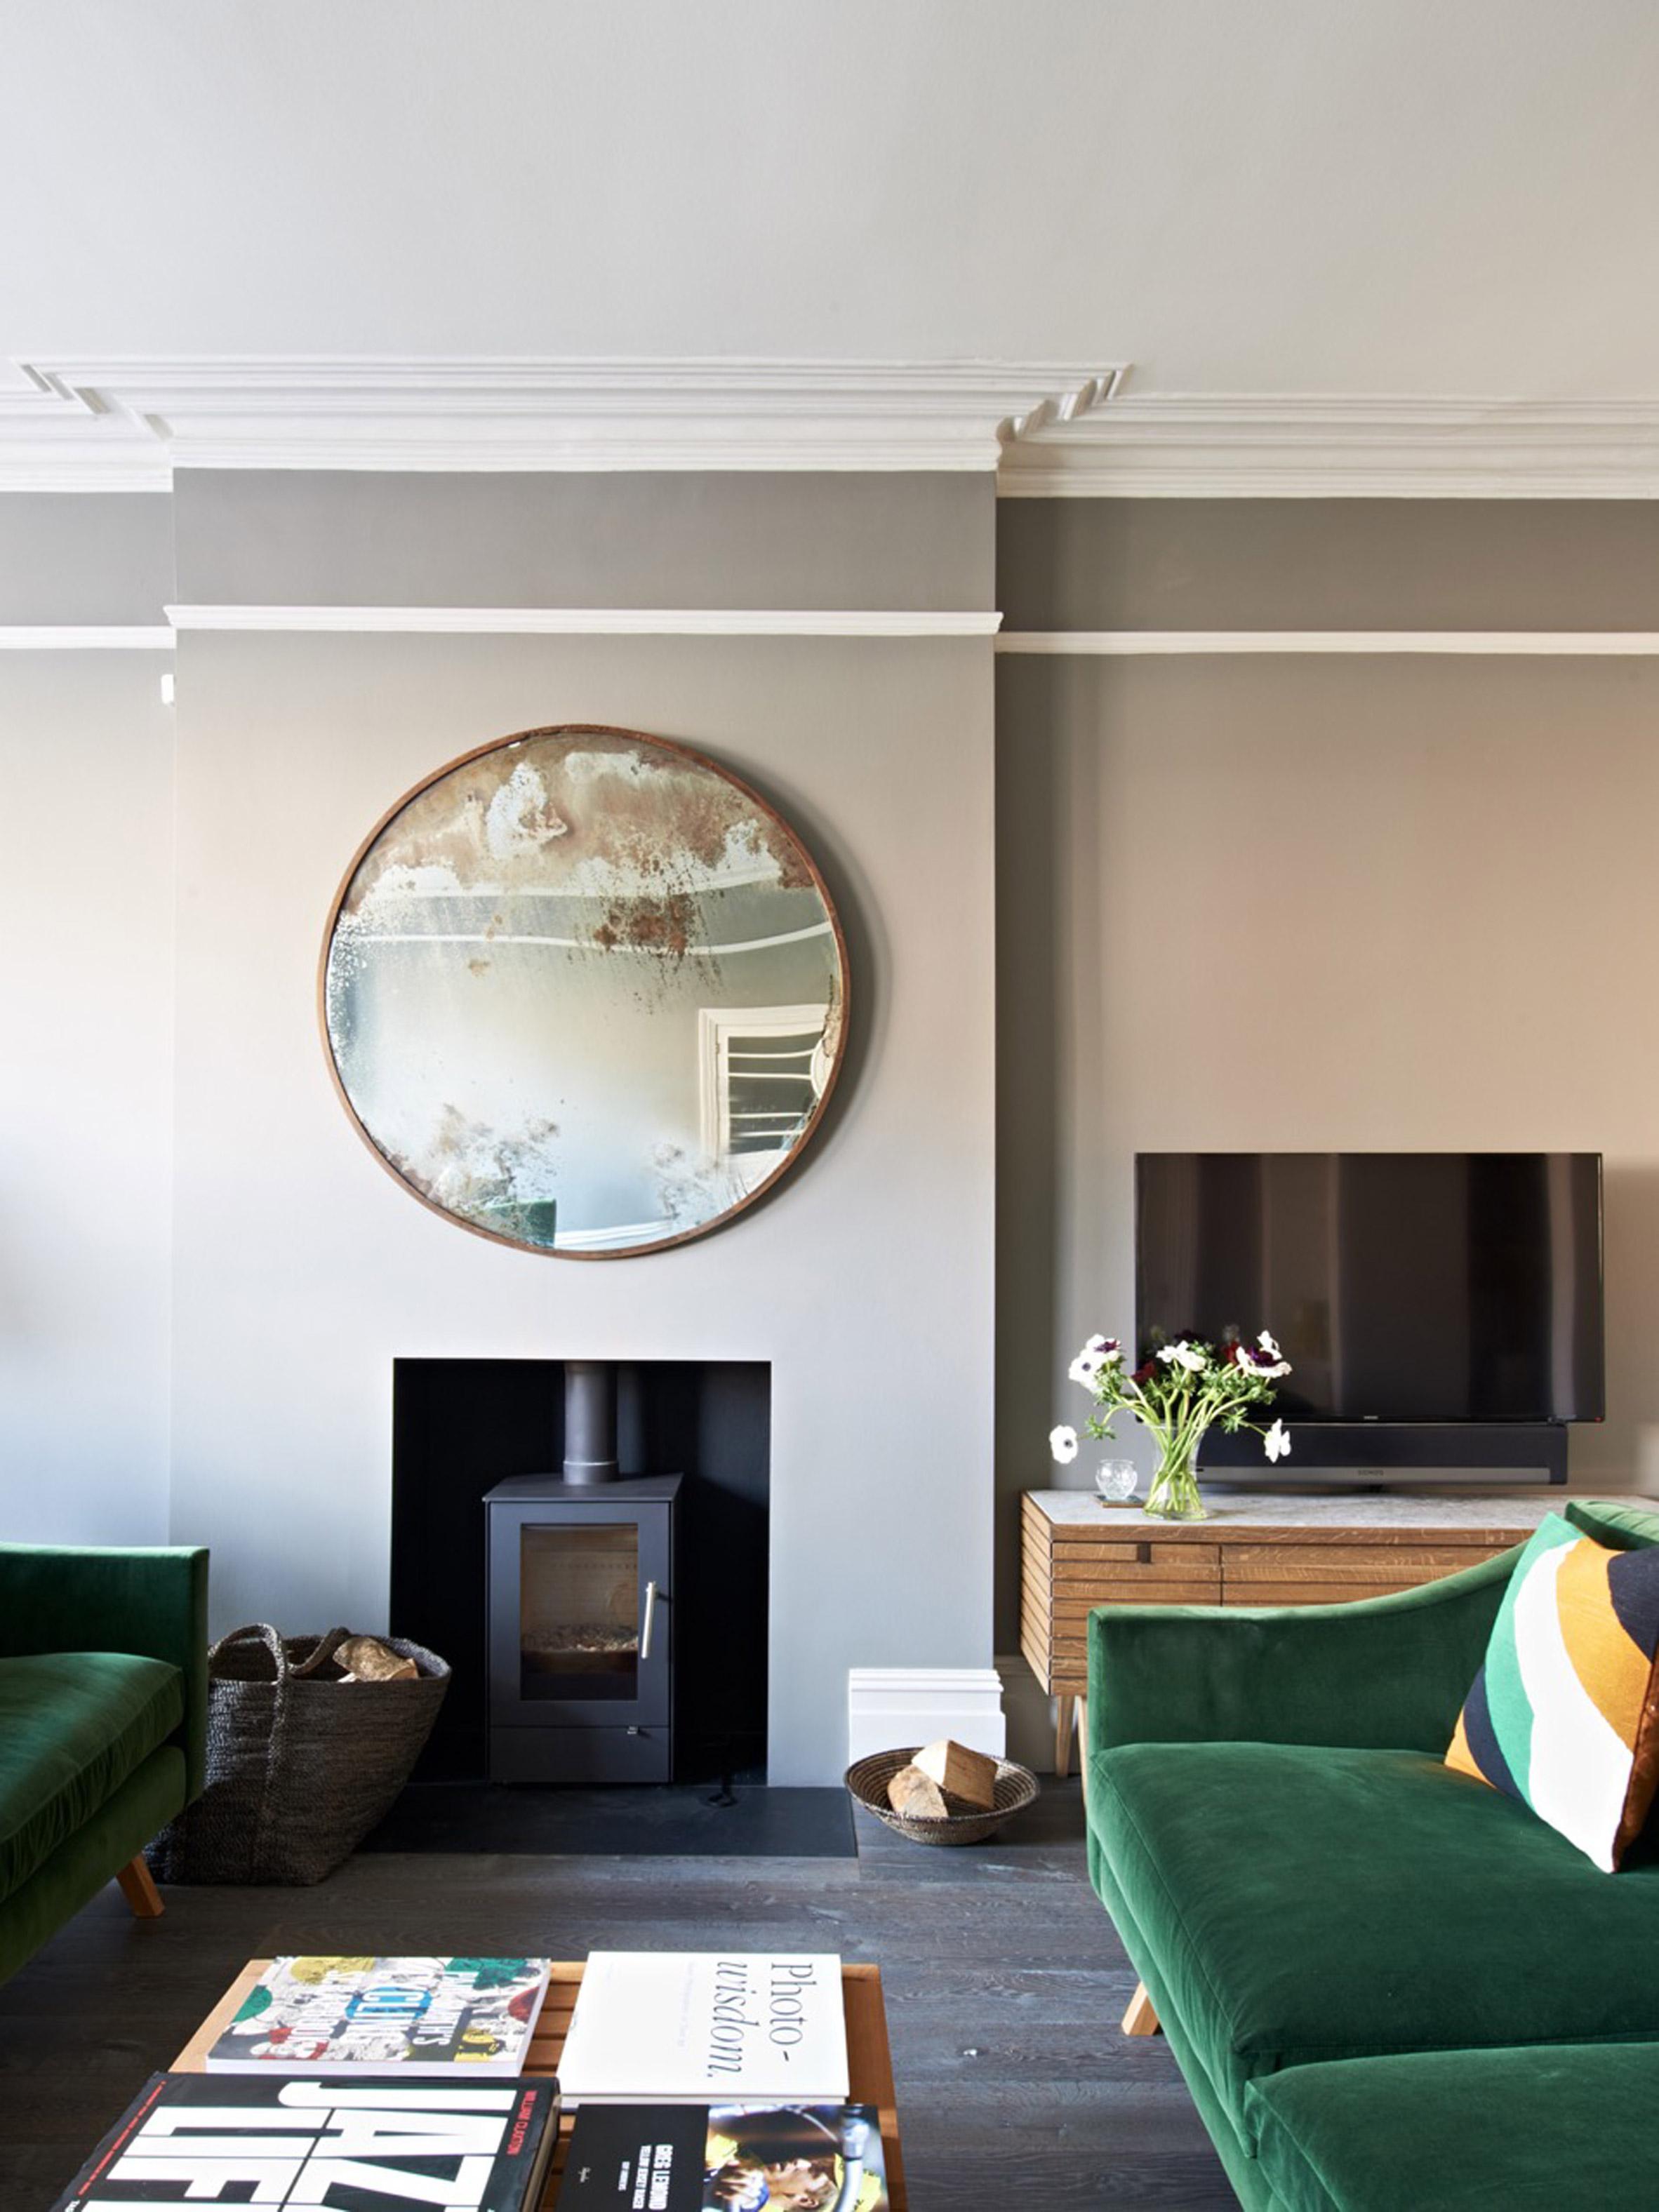 Richard Parr Architects remodels Edwardian house for Rapha founder Simon Mottram